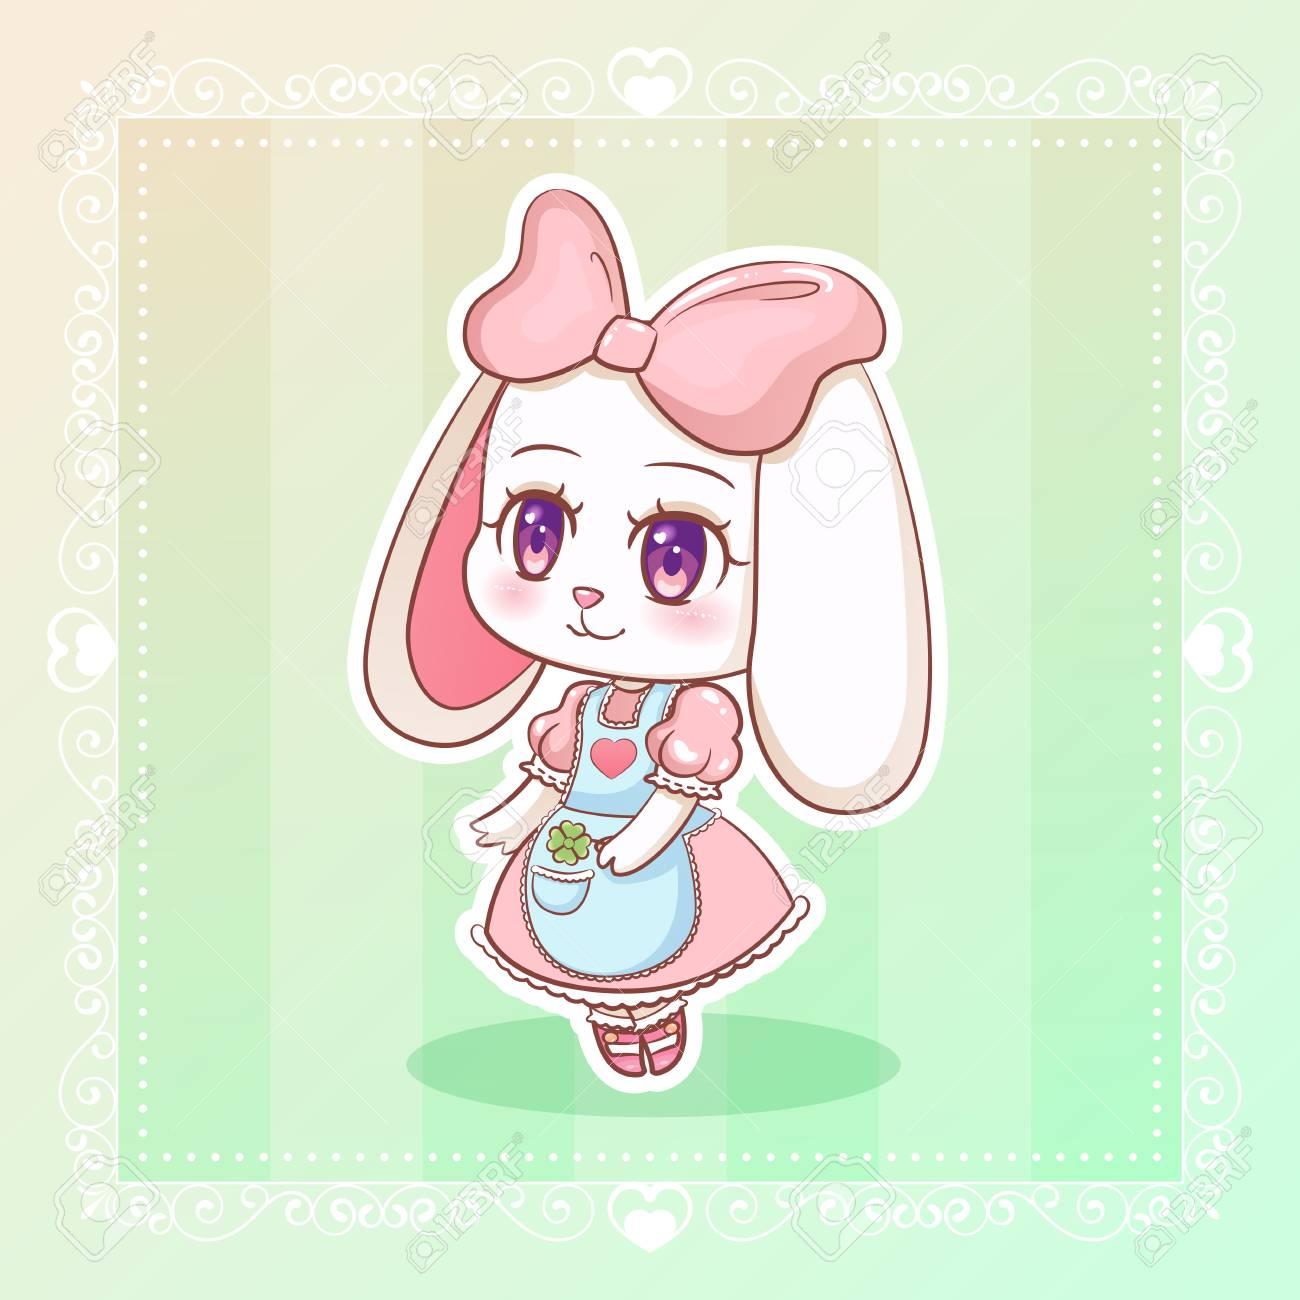 Sweet rabbit little cute kawaii anime cartoon bunny girl in dress with pink ribbon eps10 stock